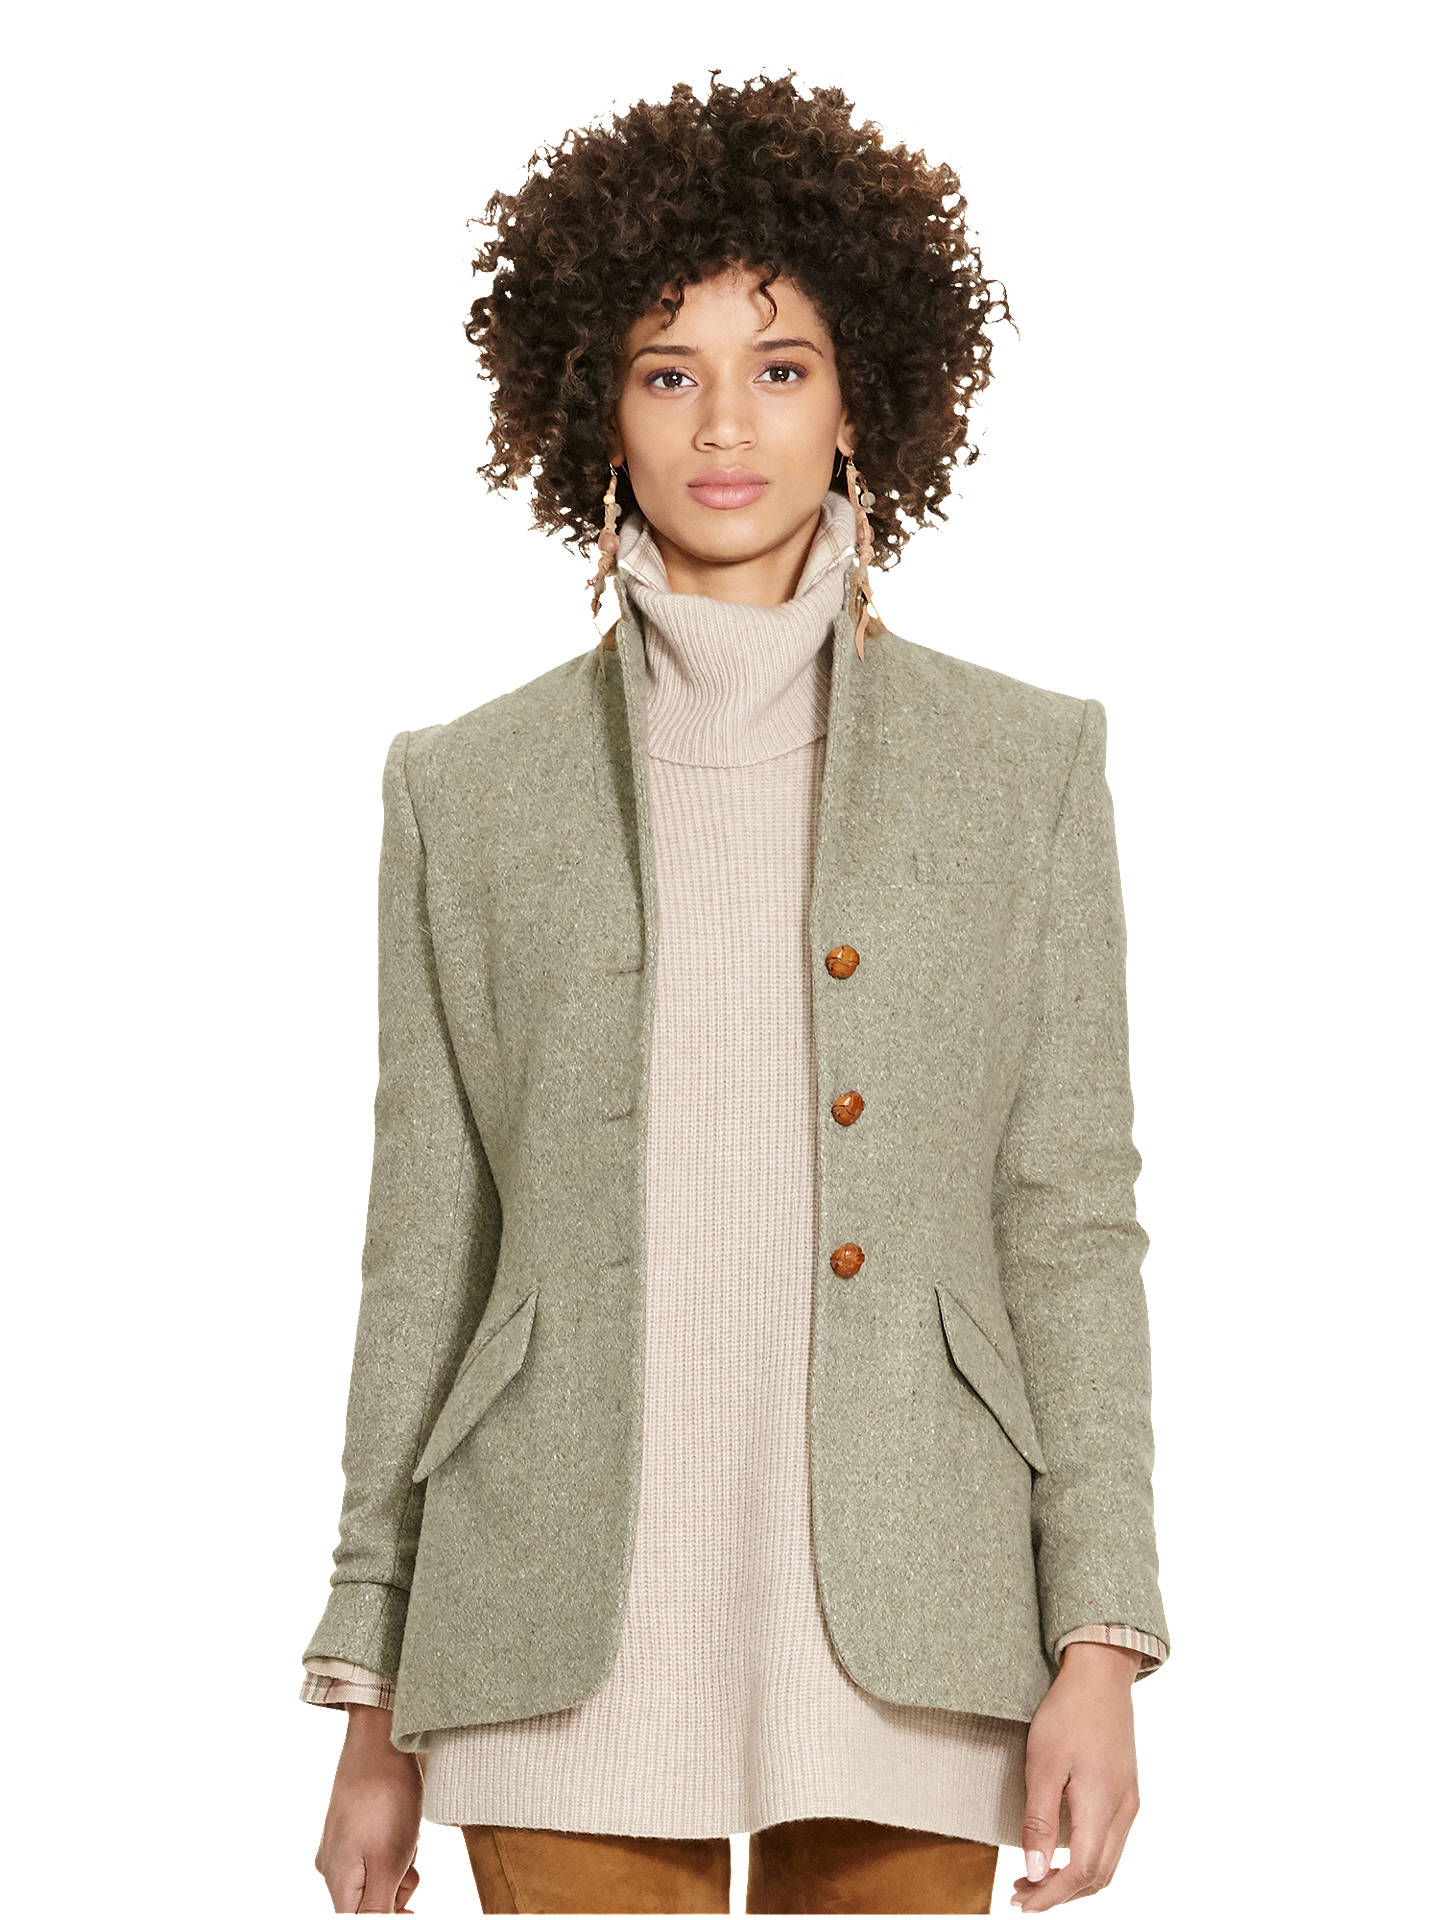 f4d1581cef96 Buy Polo Ralph Lauren Hacking Virgin Wool Jacket, Vintage Olive, 10 Online  at johnlewis ...